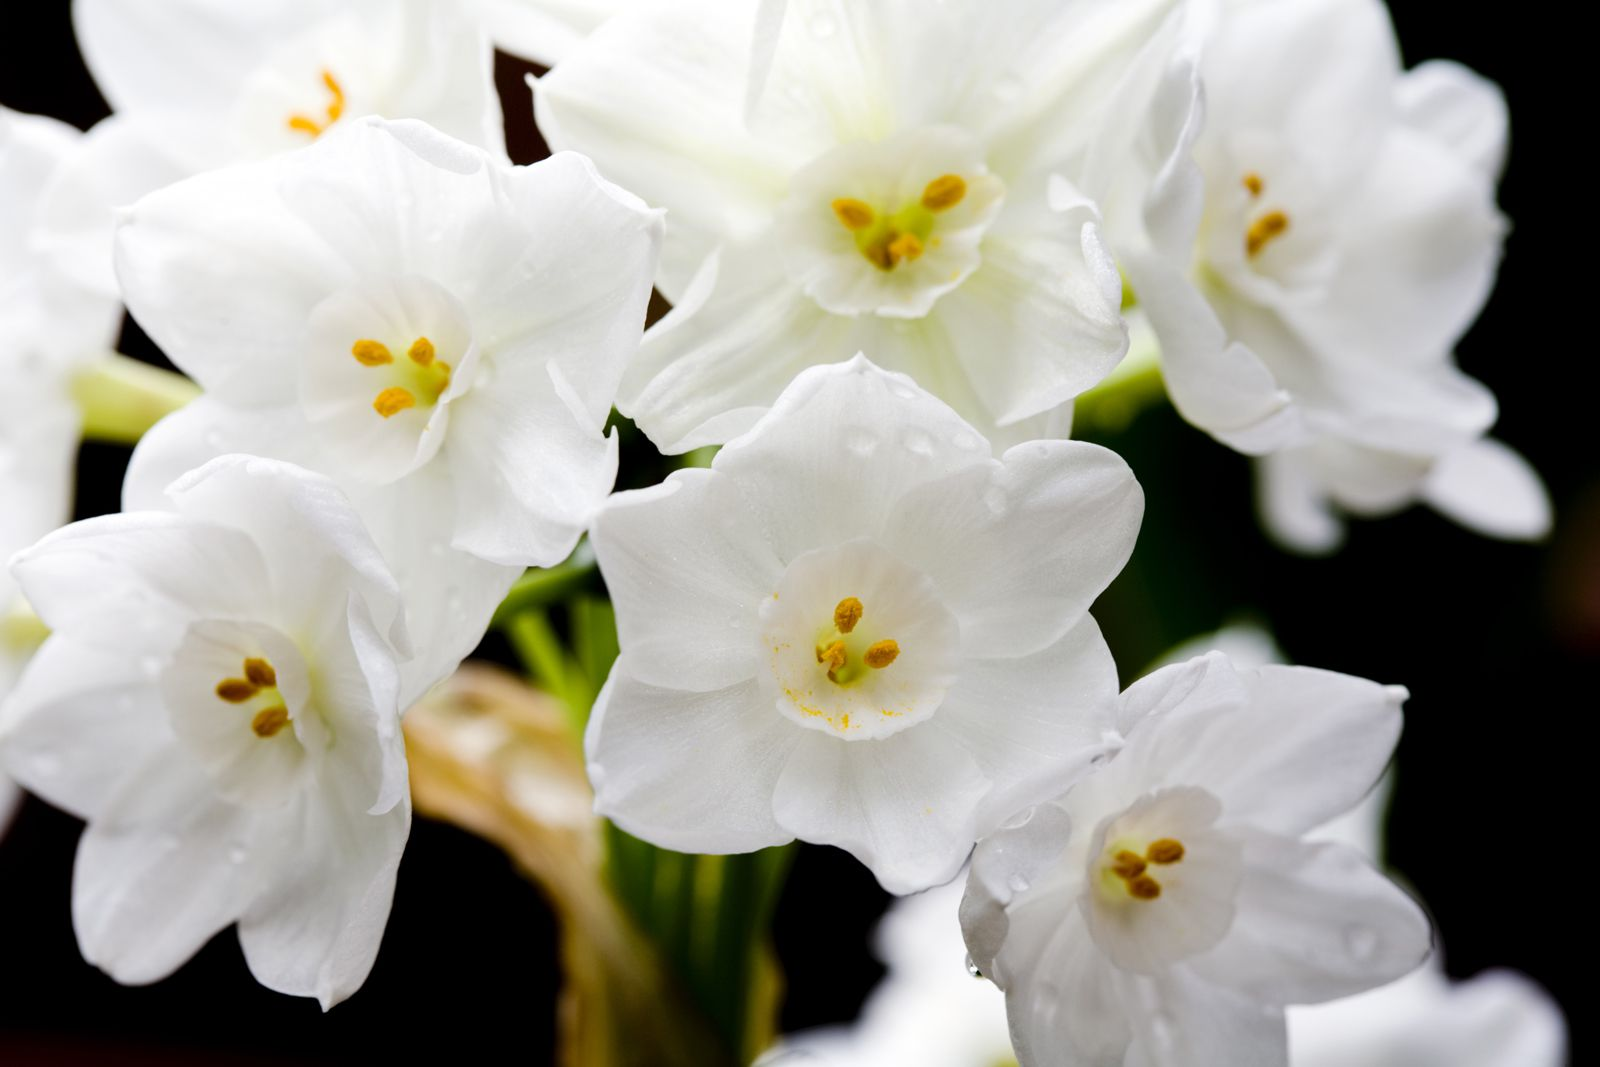 Gardening Tip Use Alcohol To Keep Paperwhites Erect